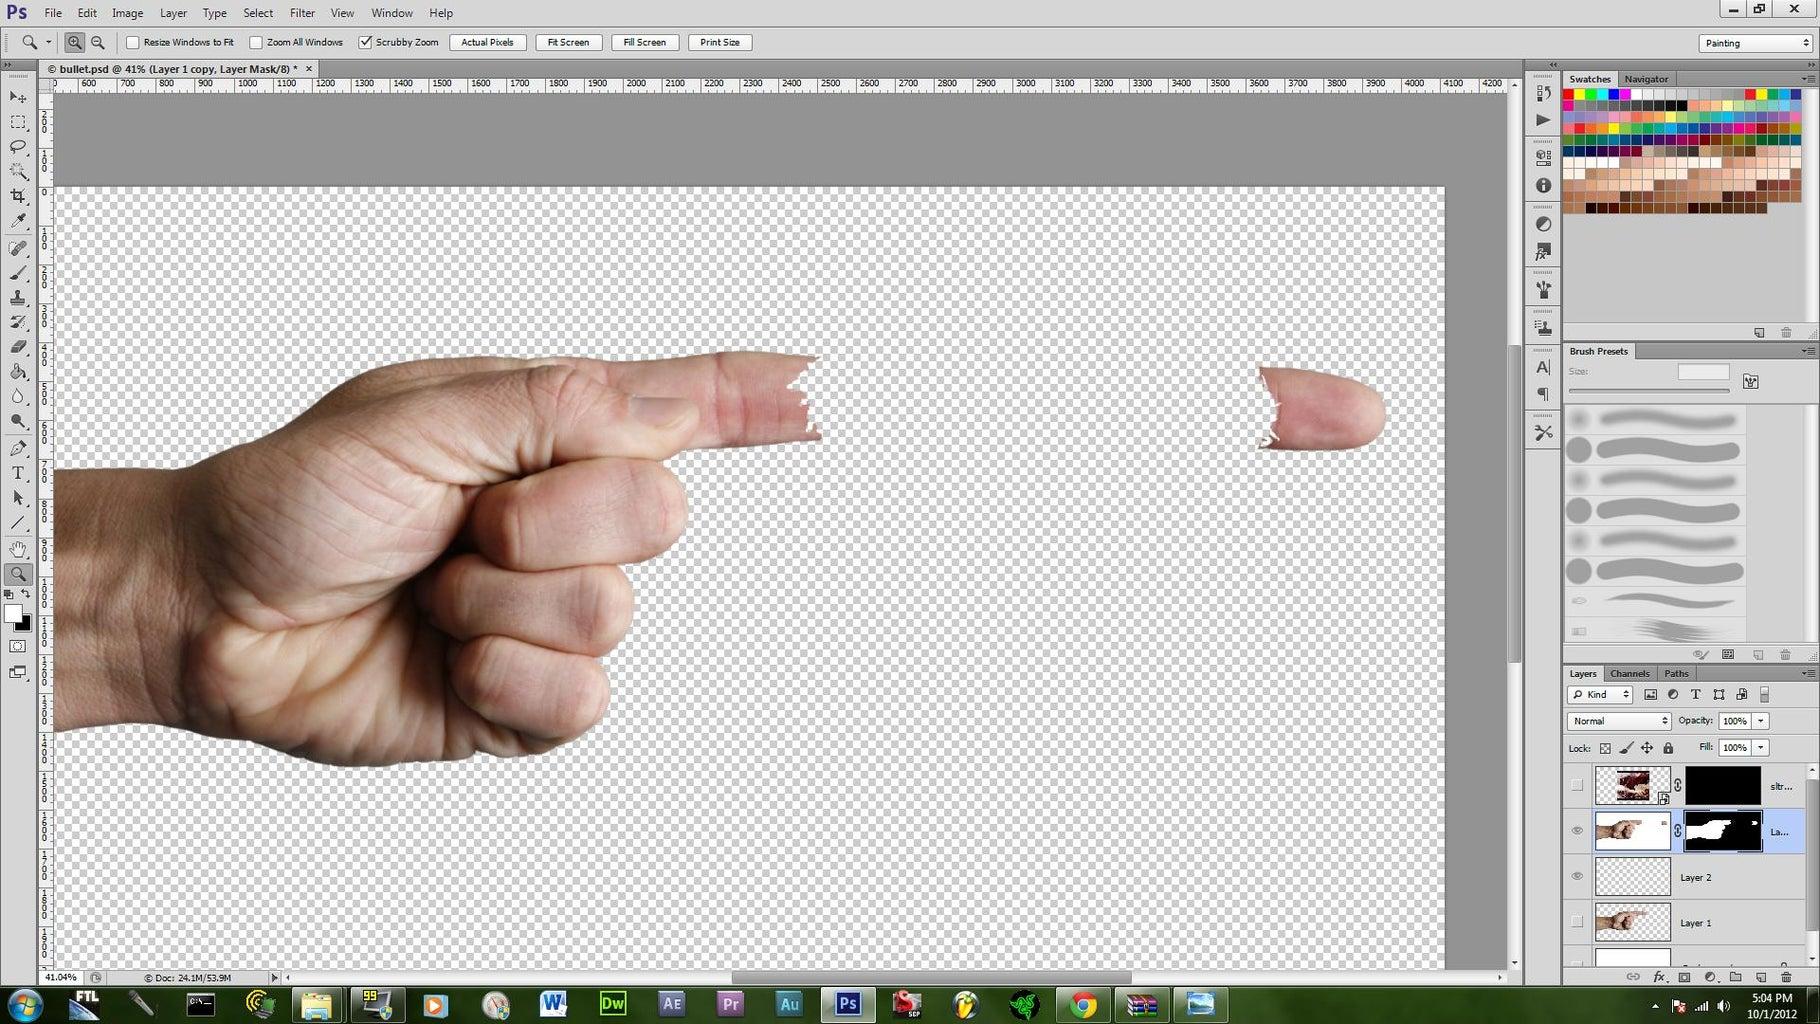 Making Ripped Finger